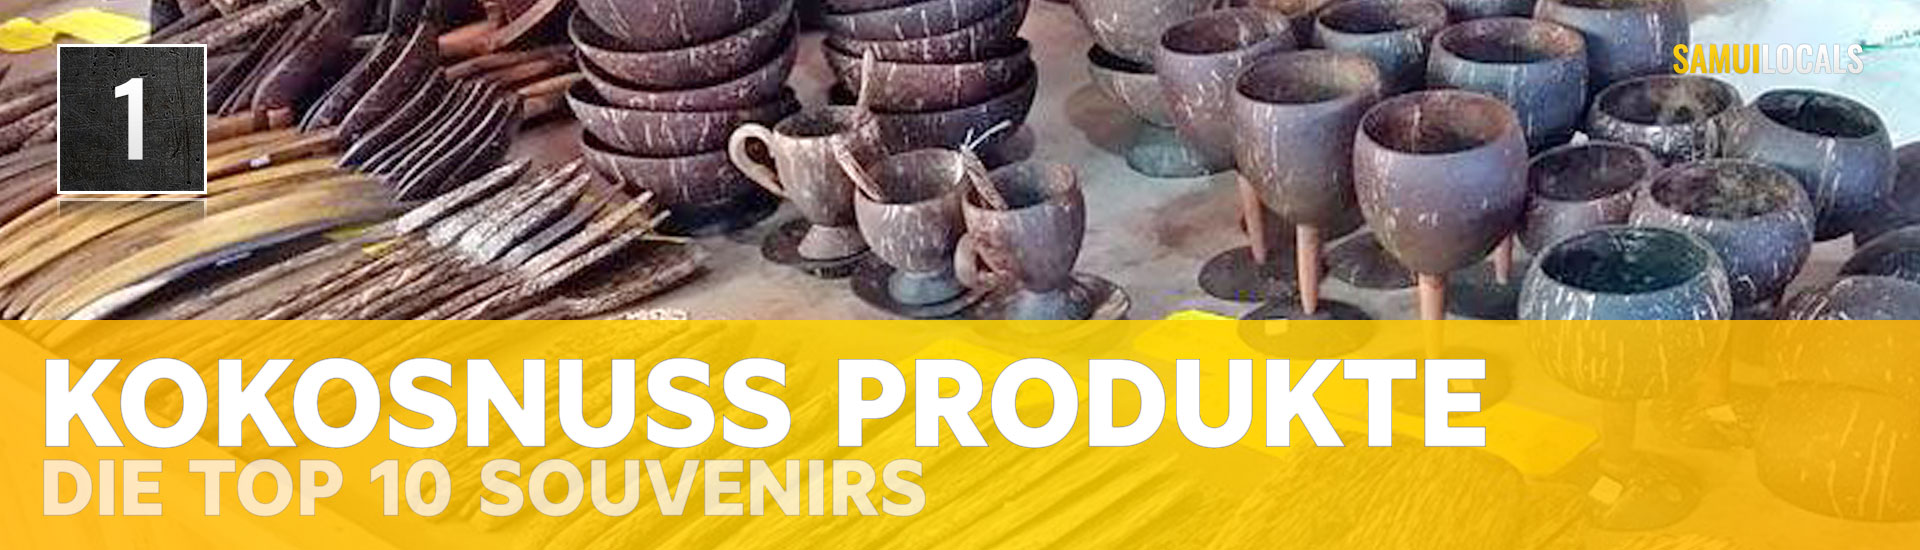 souvenirs_aus_thailand_kokusnuss_produkte